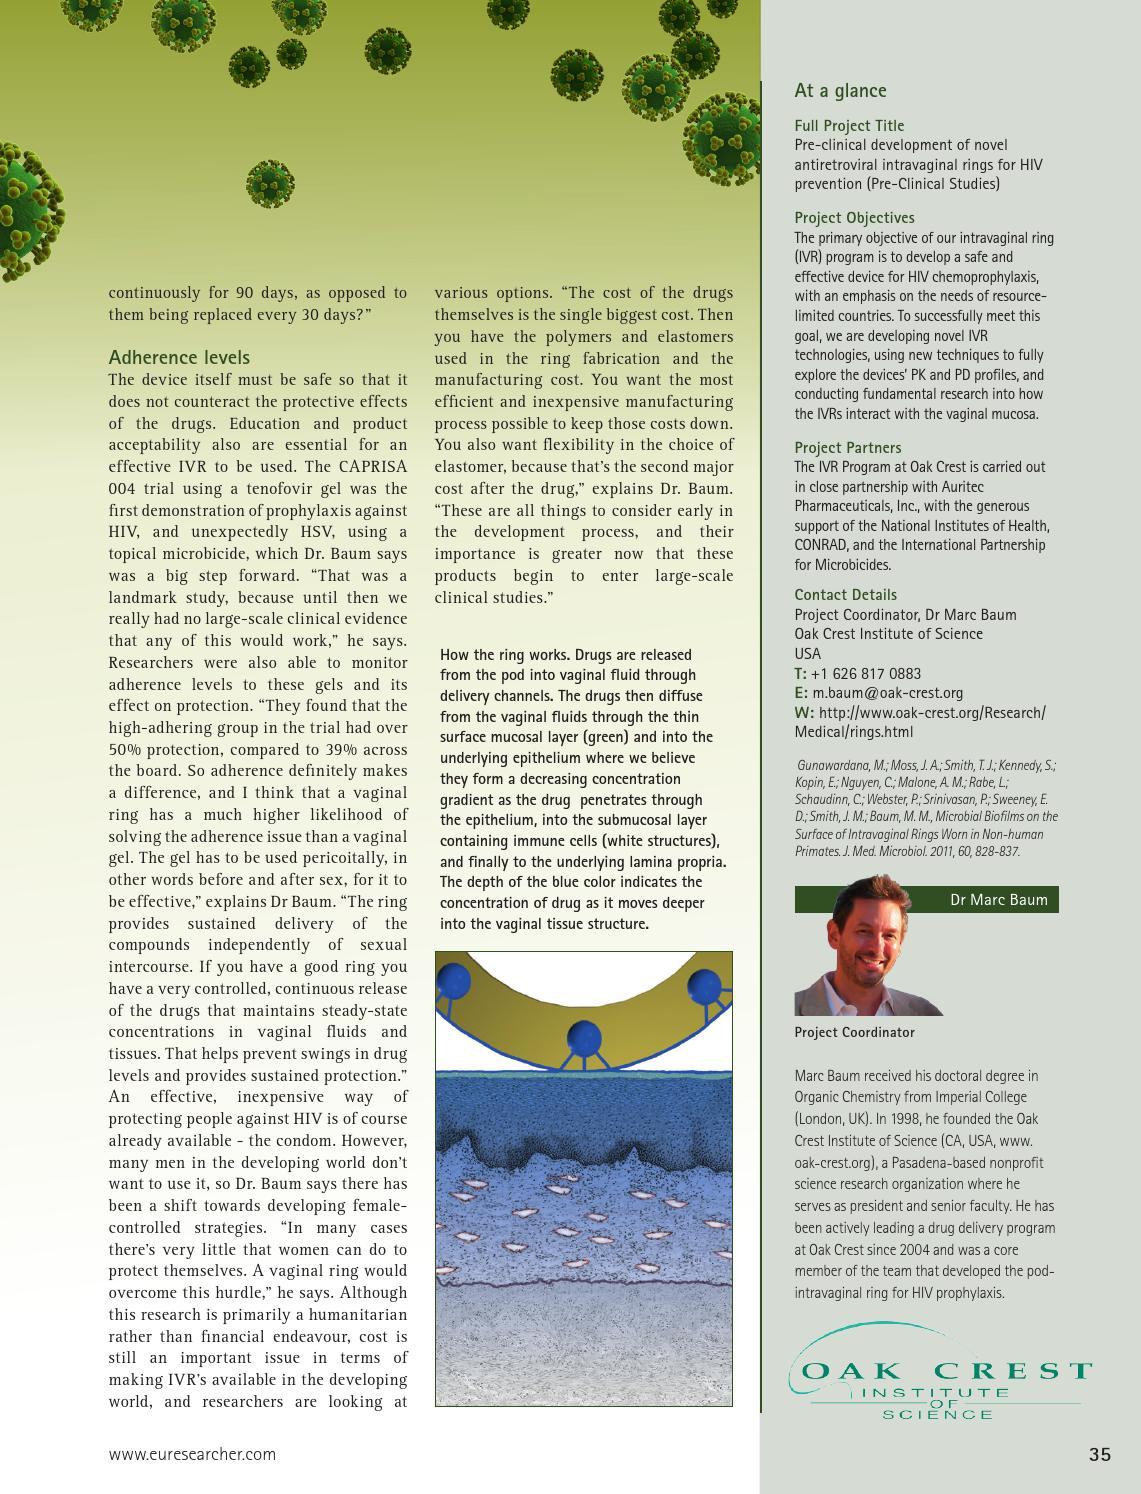 Eu research 4 digital magazine by Blazon Publishing and Media Ltd